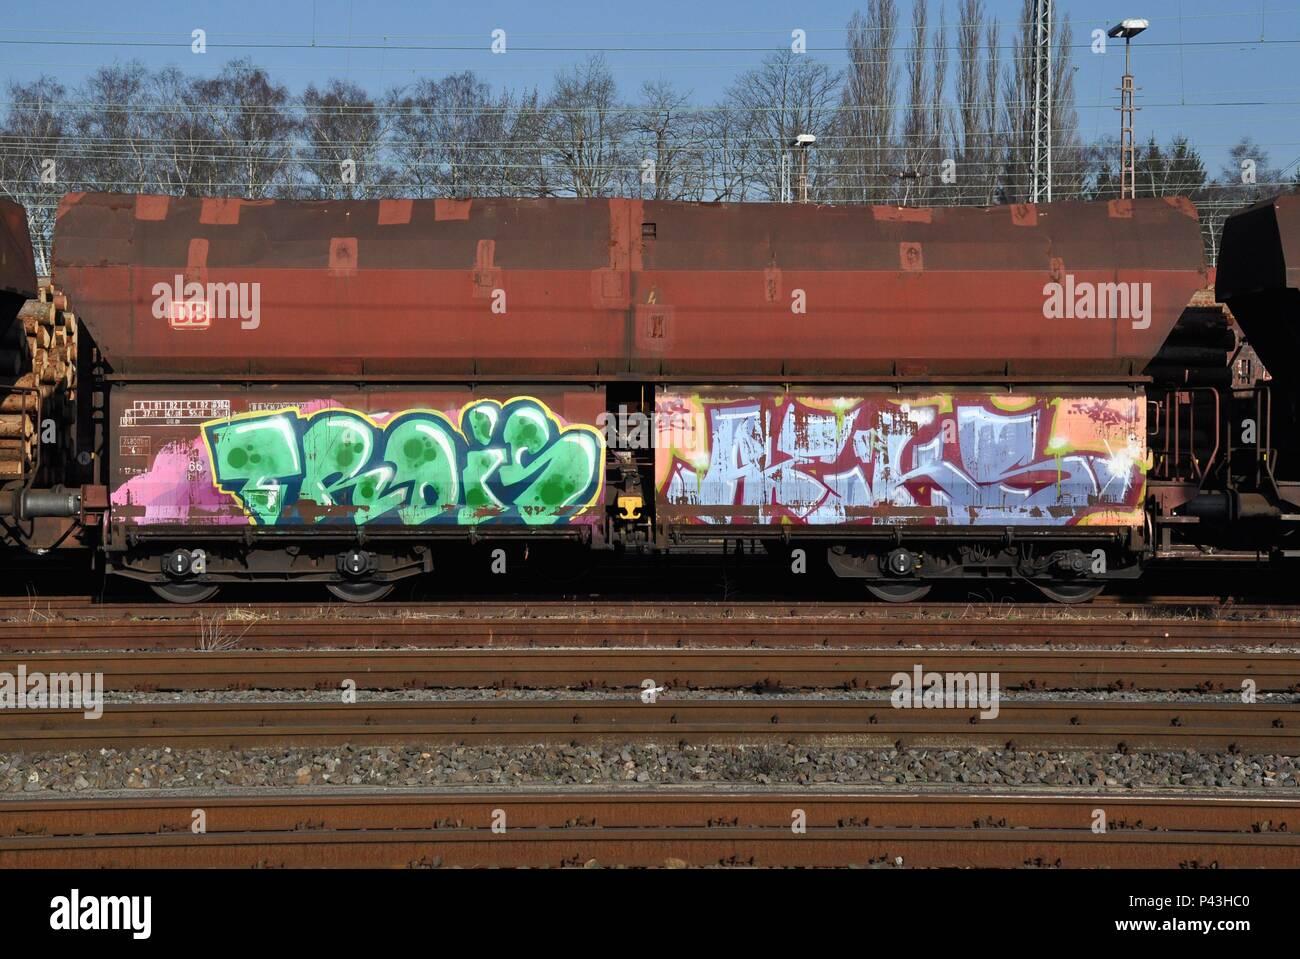 Graffiti on freight waggon on 28.03.2015 in Schwerte/Ruhr - Germany. | usage worldwide - Stock Image